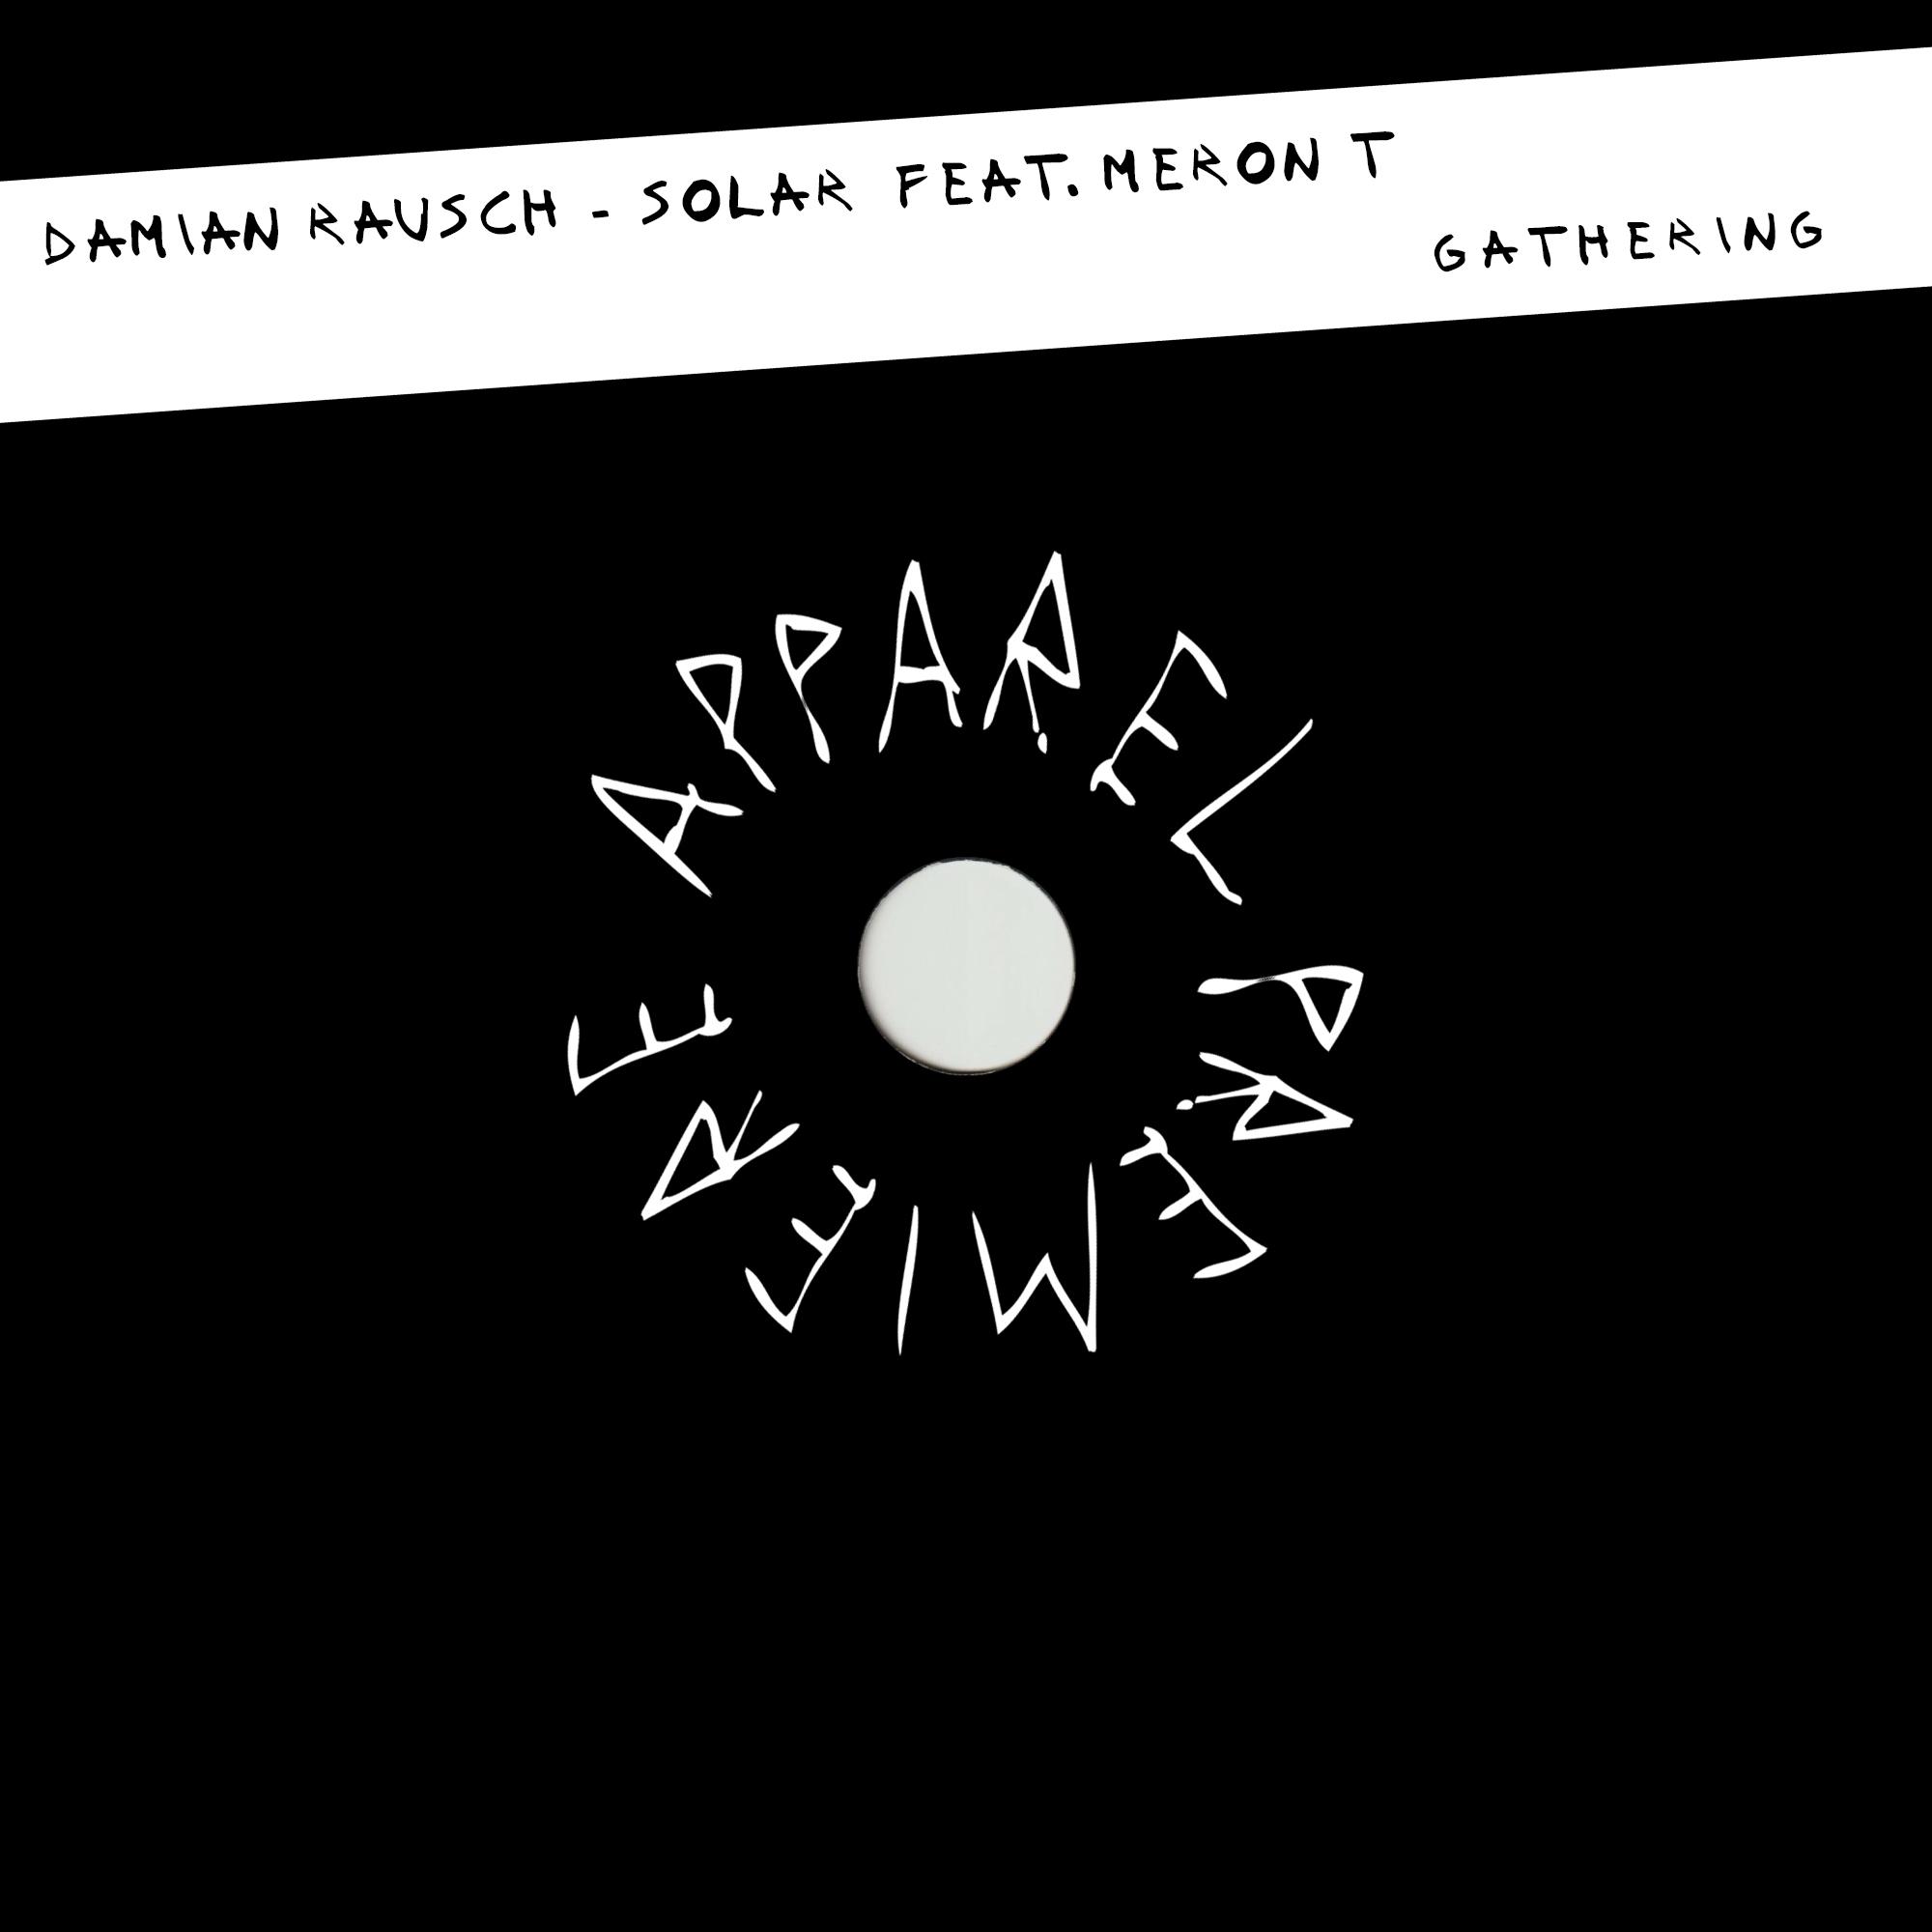 APPAREL PREMIERE: Damian Rausch – Solar feat. Meron T [Gathering]